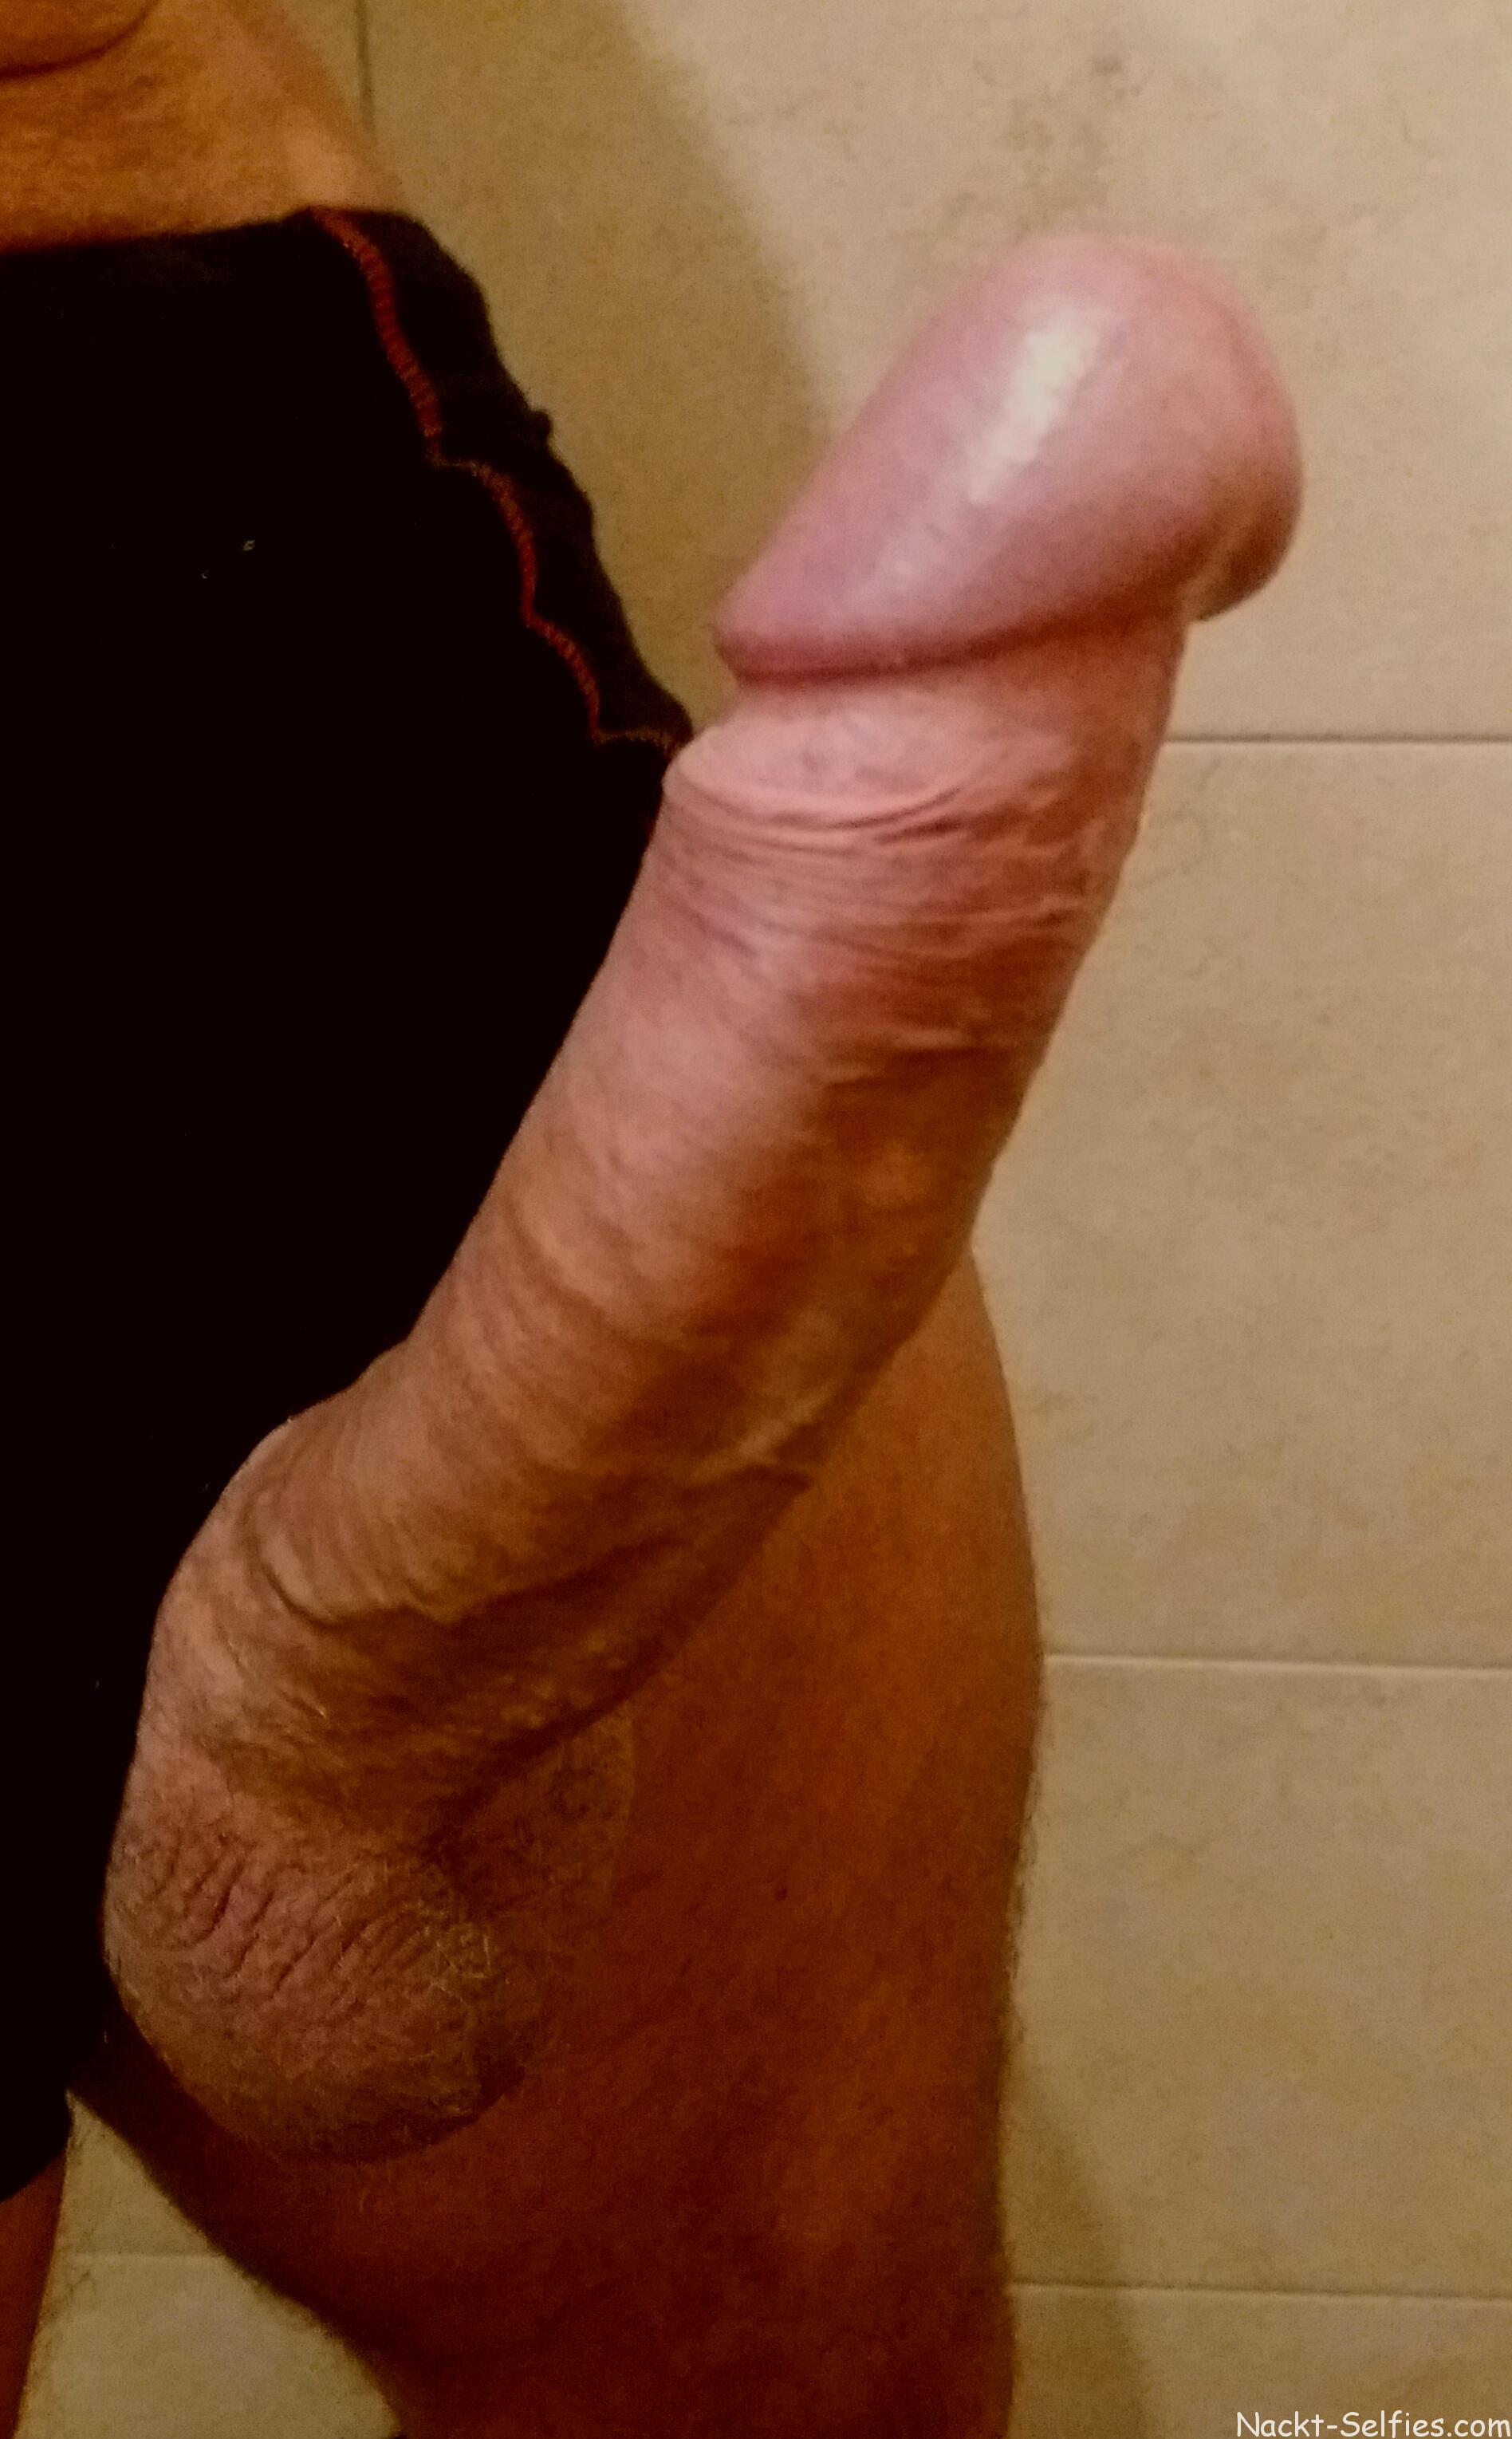 Geile Penis